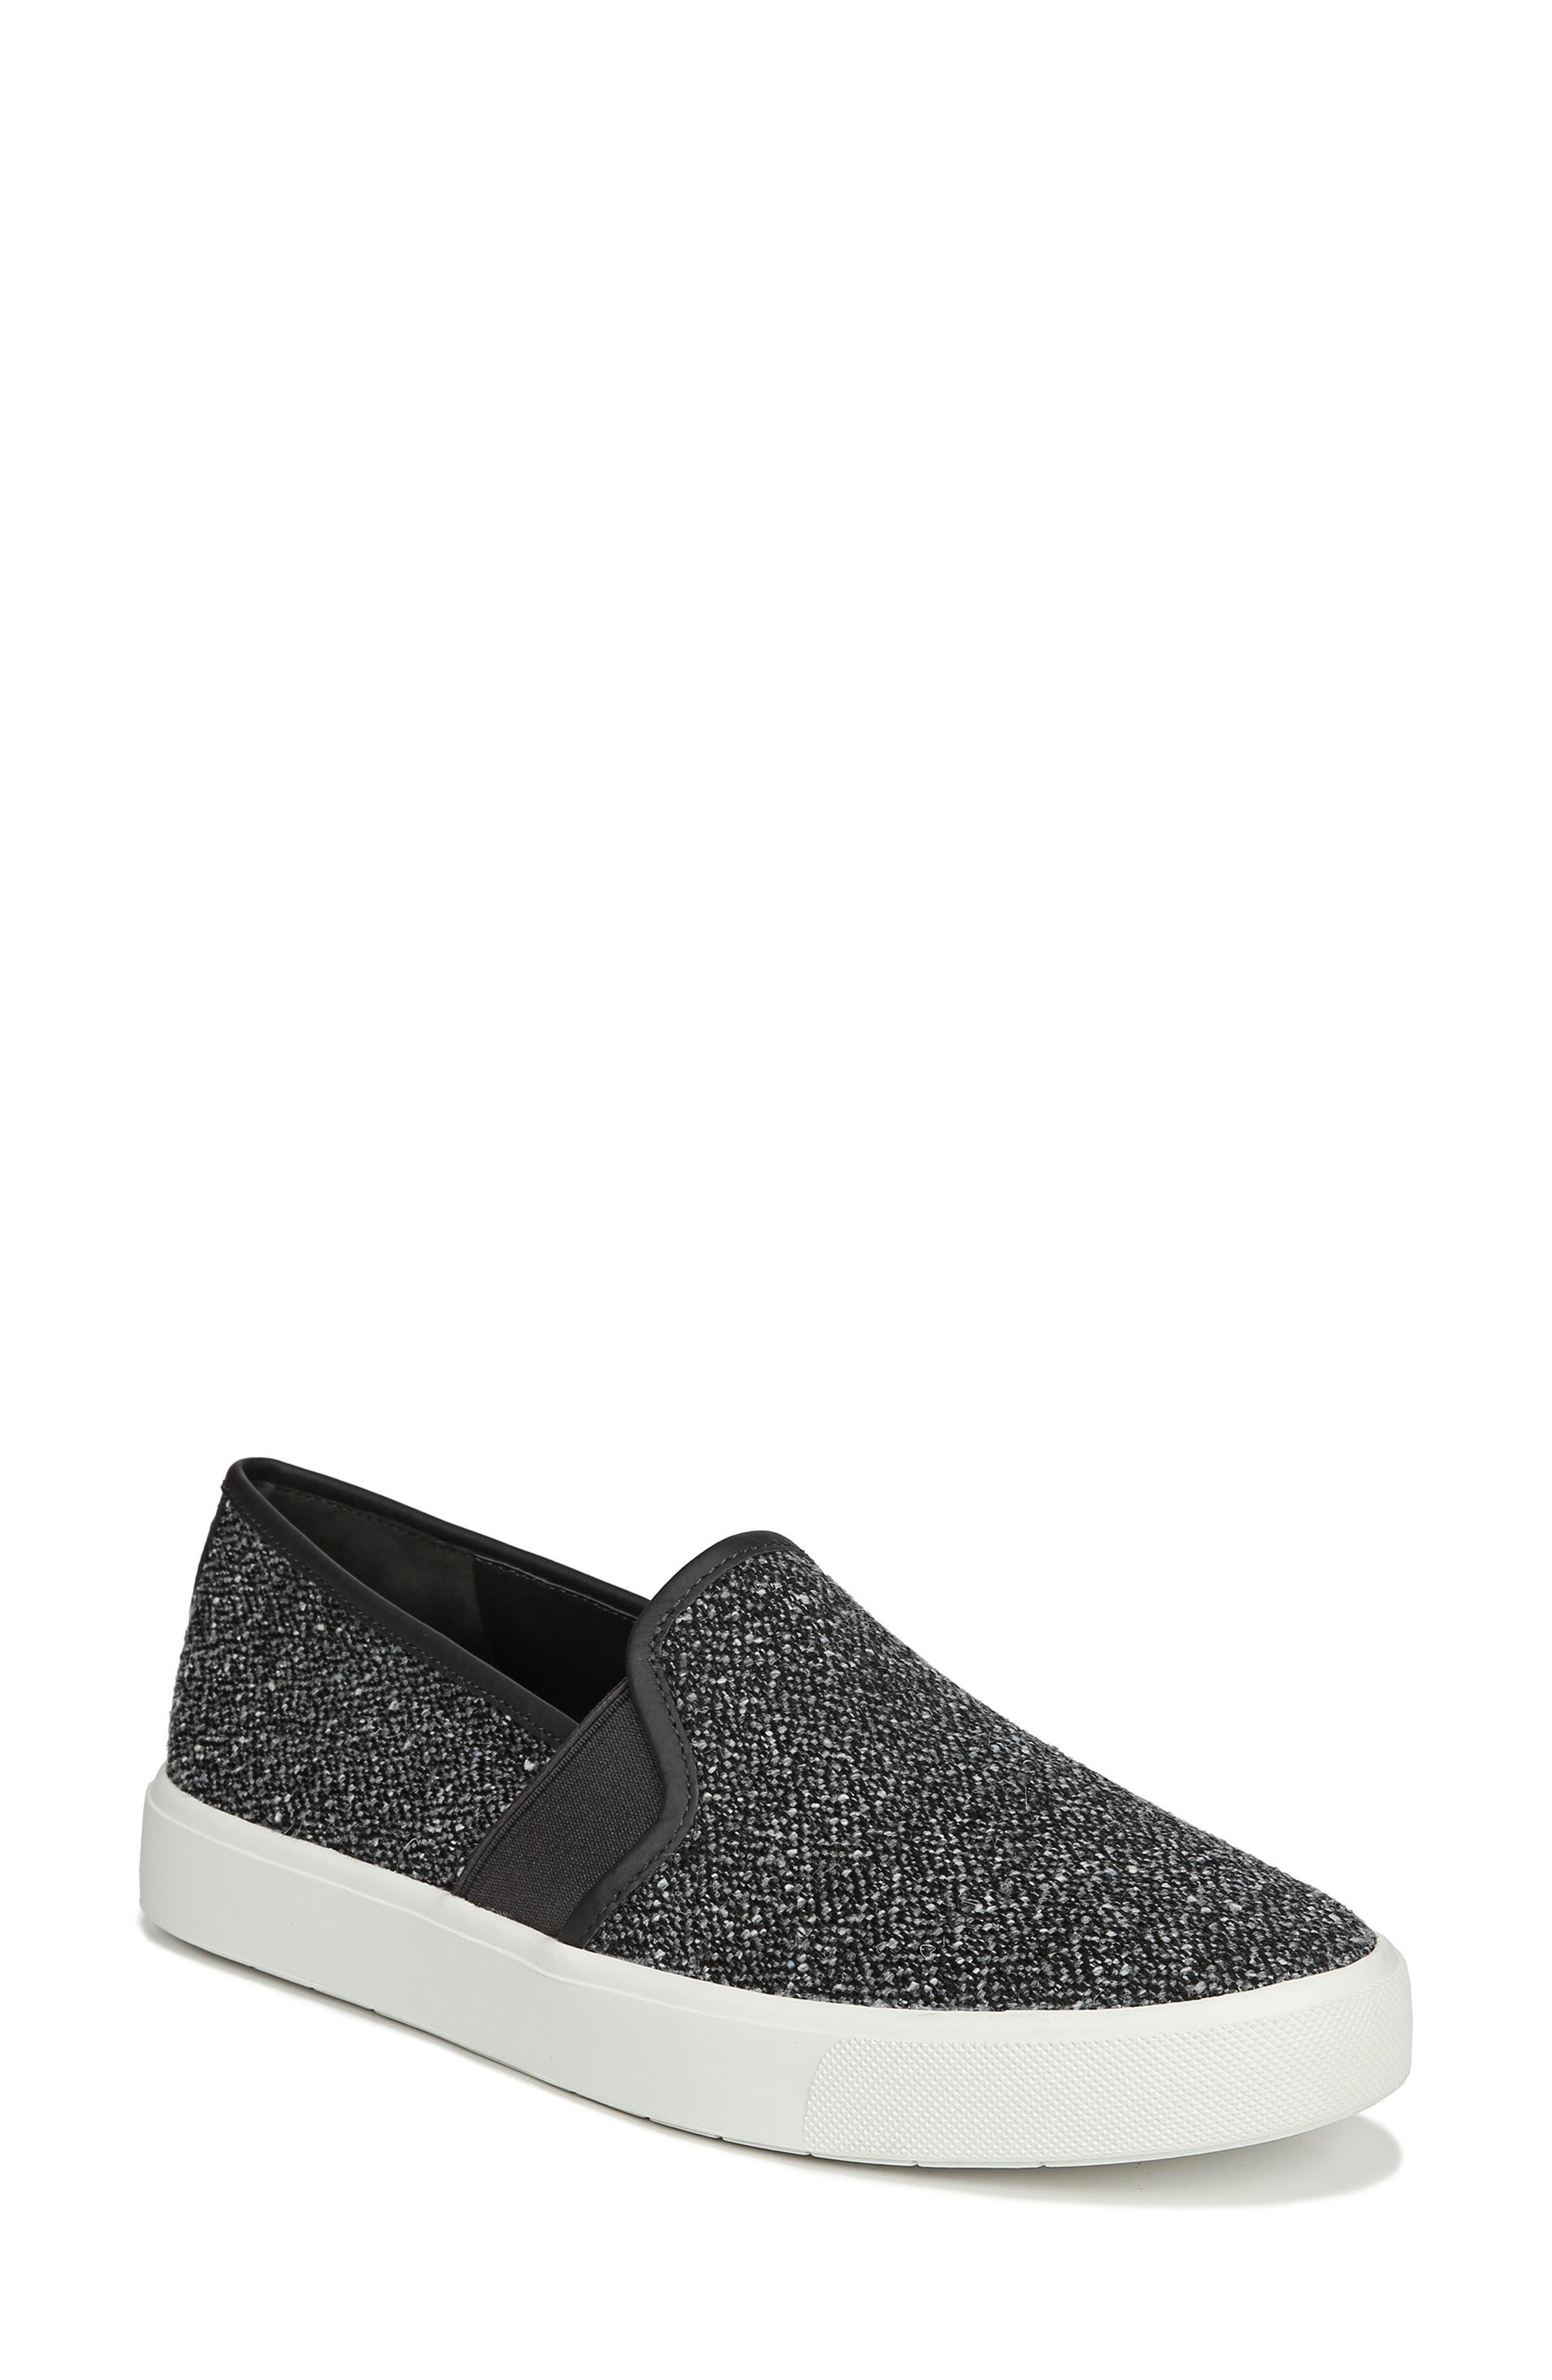 Blair 5 Slip-On Sneaker,                         Main,                         color, GREY